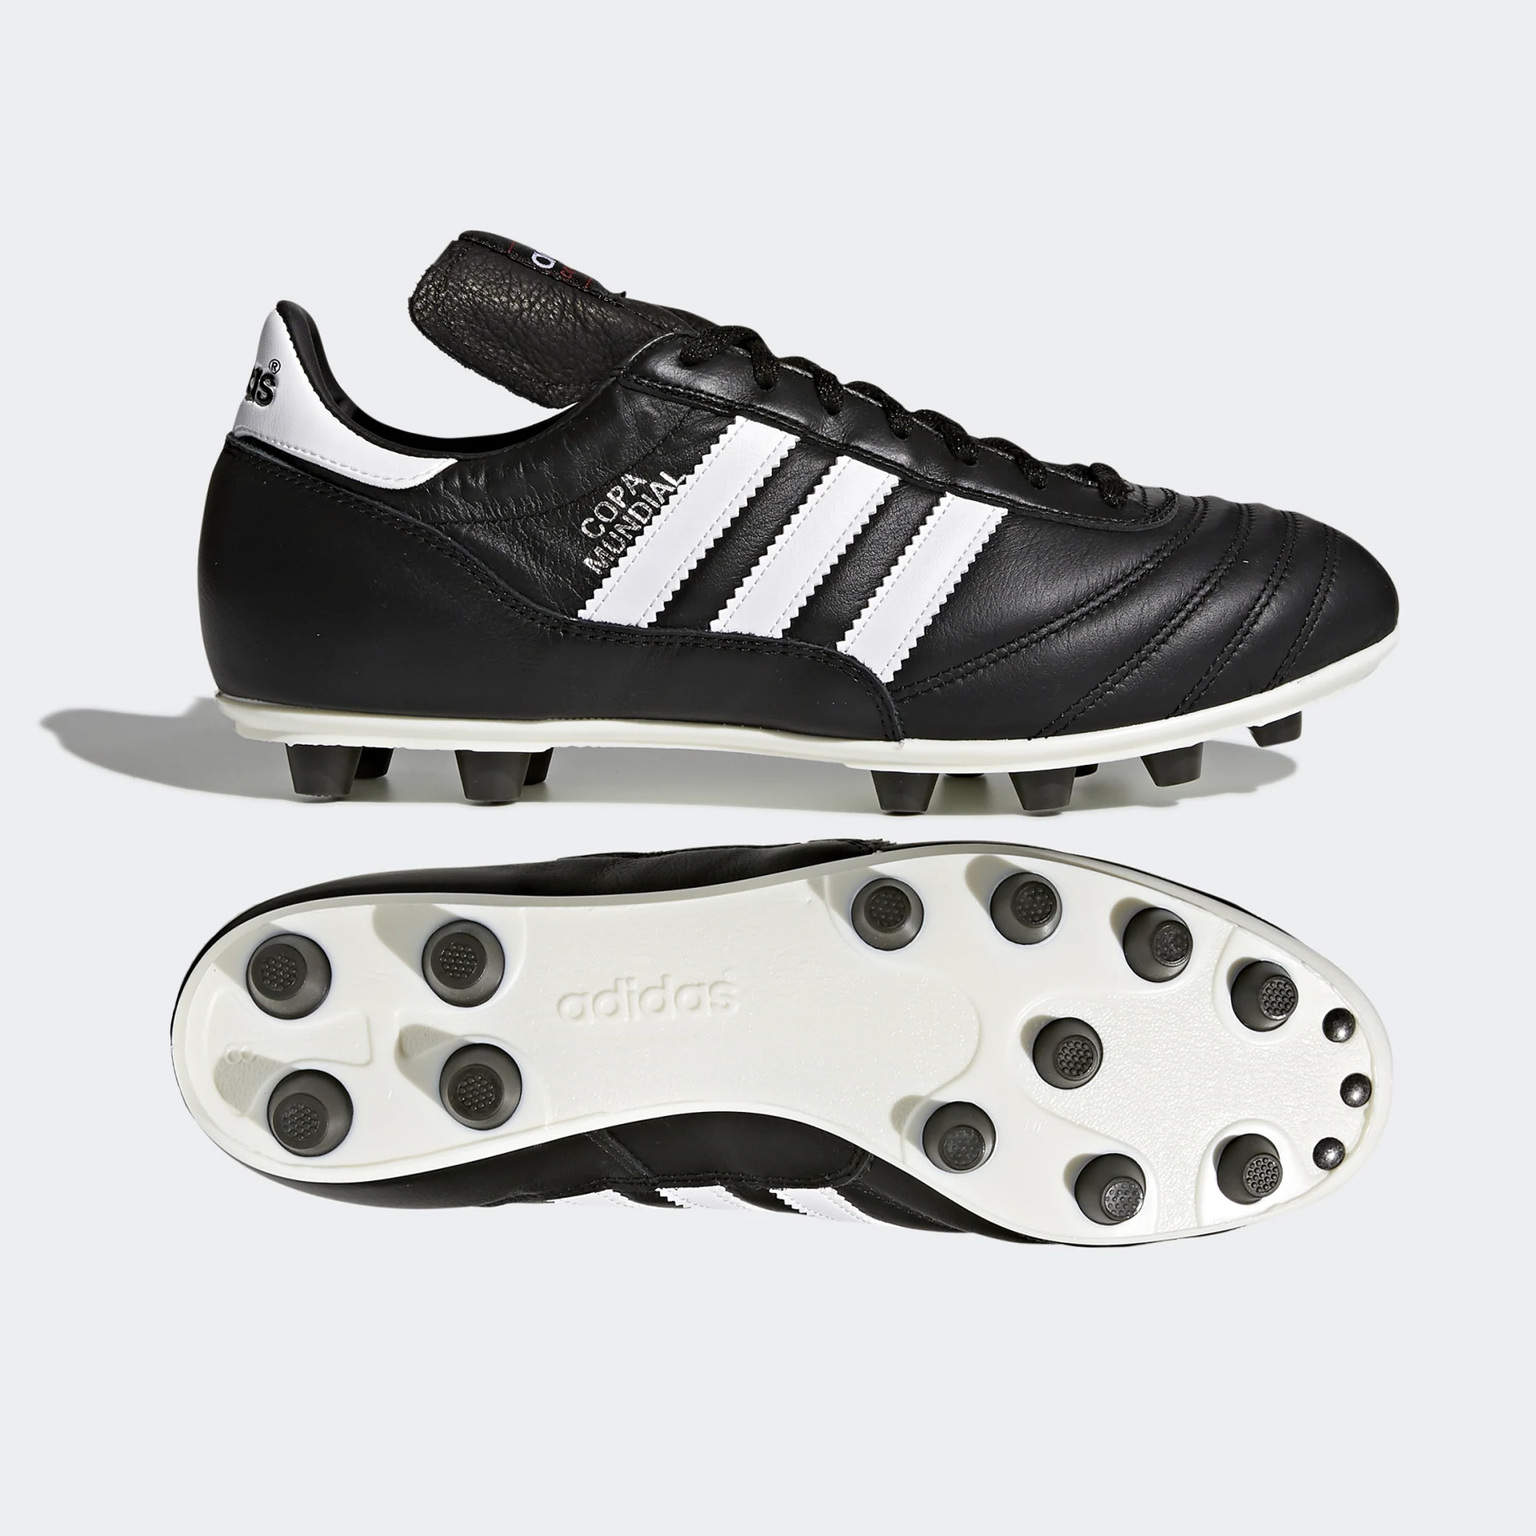 edb7ab0e ... Бутсы Adidas Copa Mundial FG 015110. О ТОВАРЕ; РАСЧЕТ ДОСТАВКИ